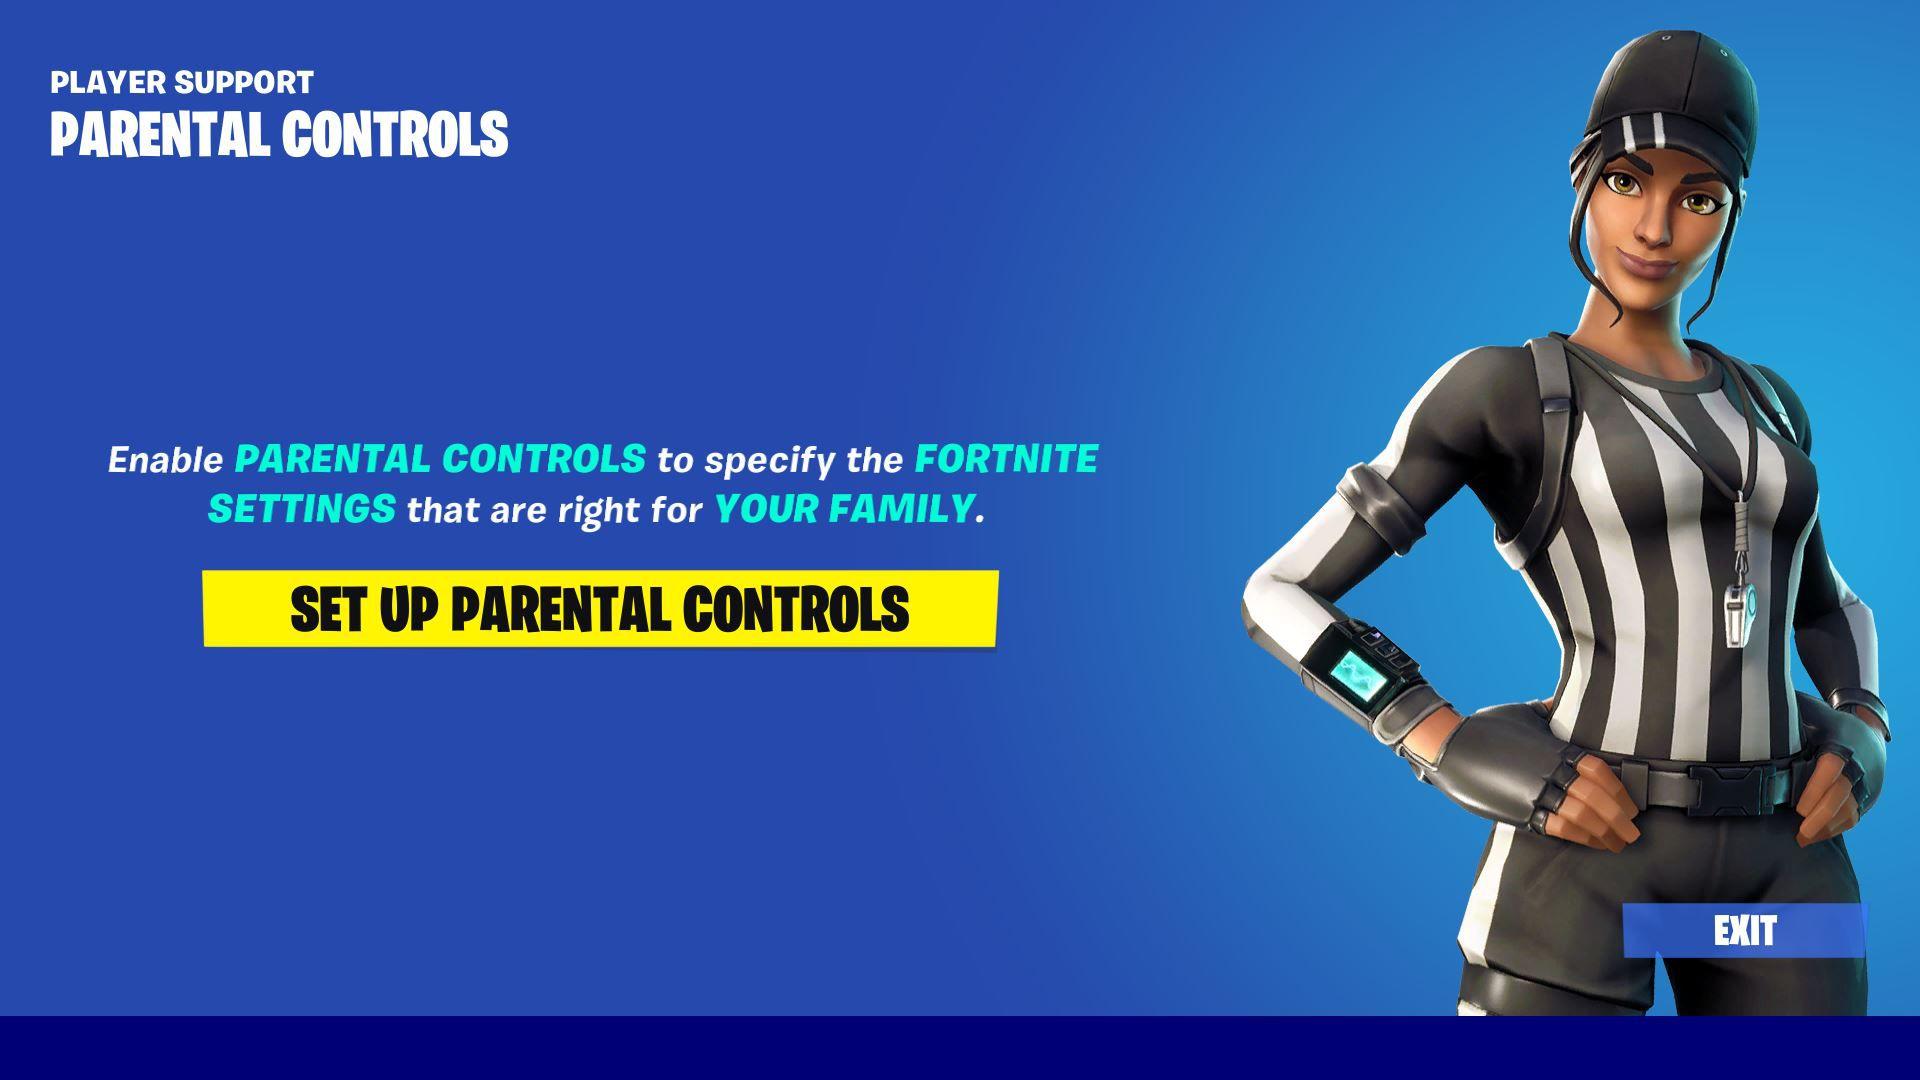 A screenshot of the Fortnite parental control setup screen.